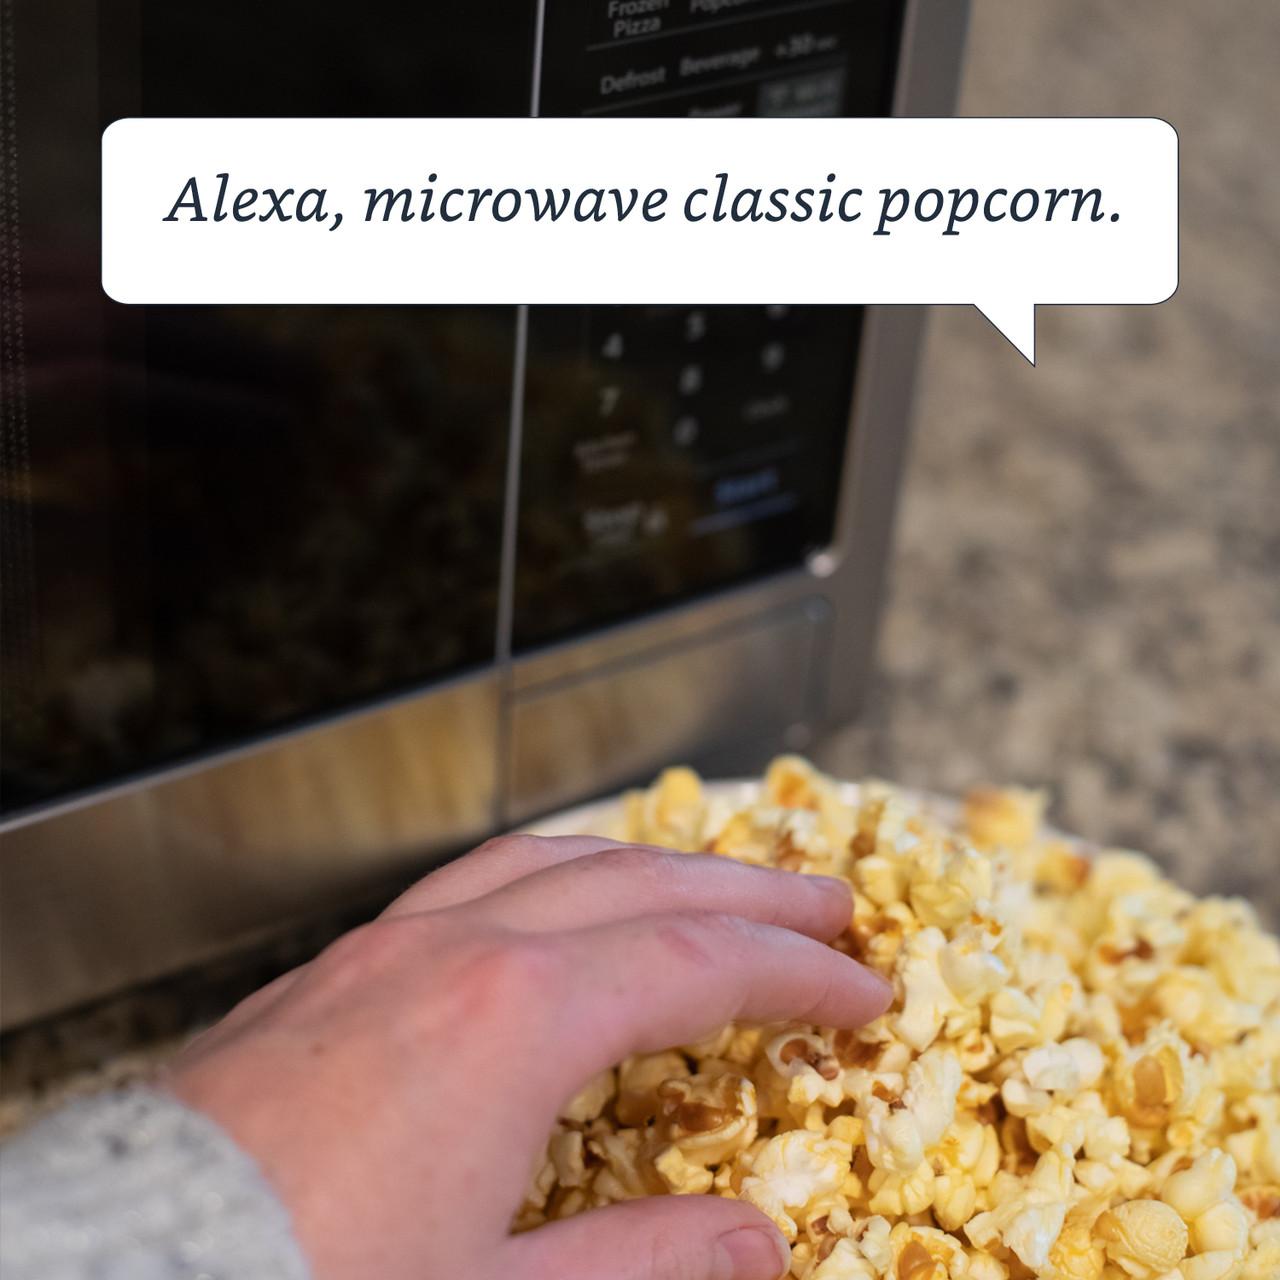 1.1 cu. ft. Sharp Stainless Steel Smart Microwave (SMC1139FS) –Alexa Microwave Popcorn Command